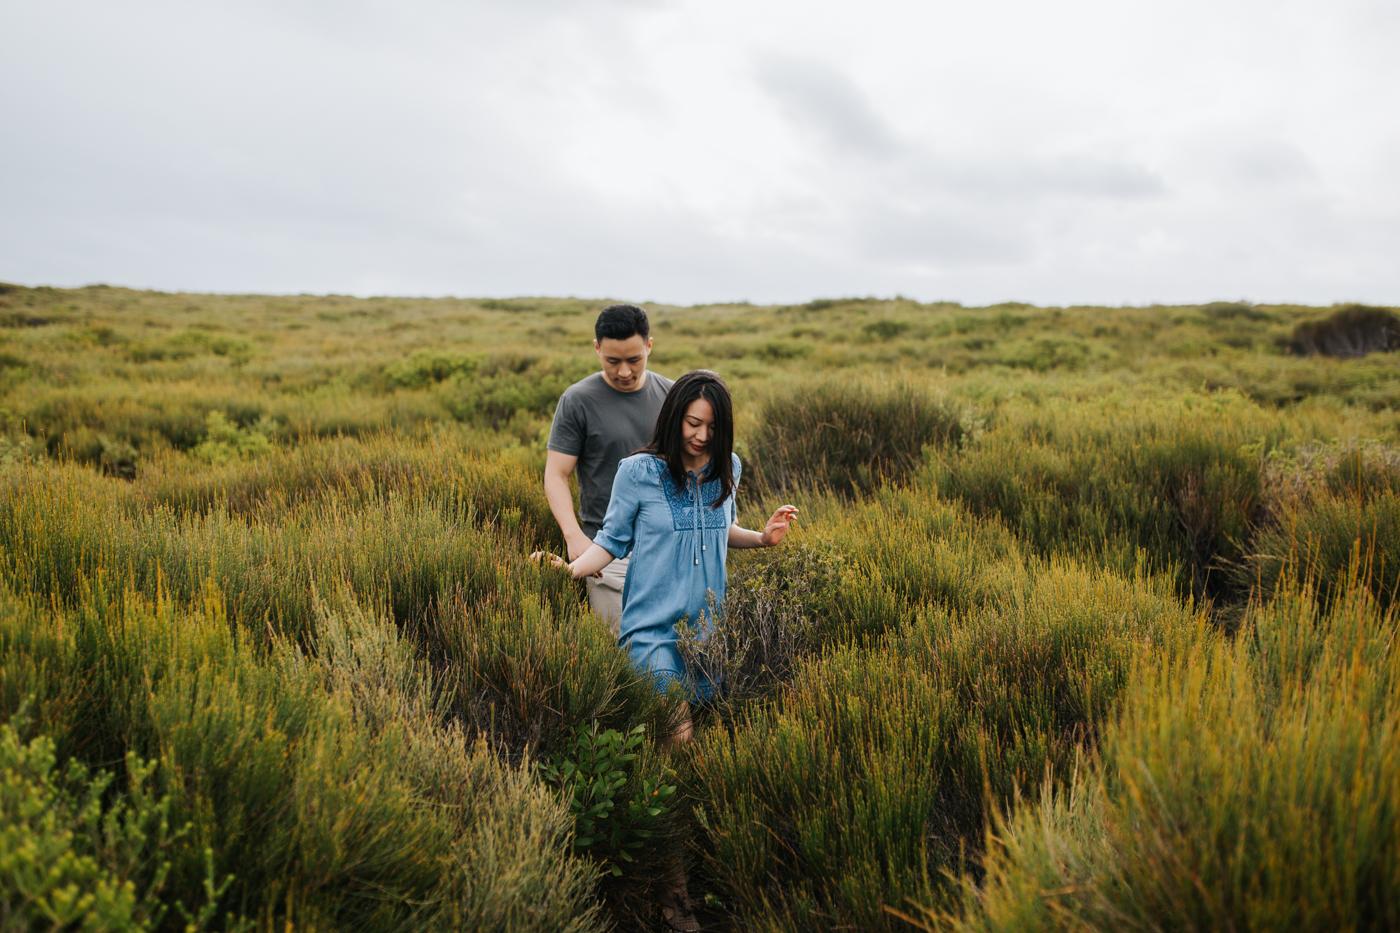 Lishien & Jason Engagement - Kurnell Cliffs - Samantha Heather Photography-54.jpg